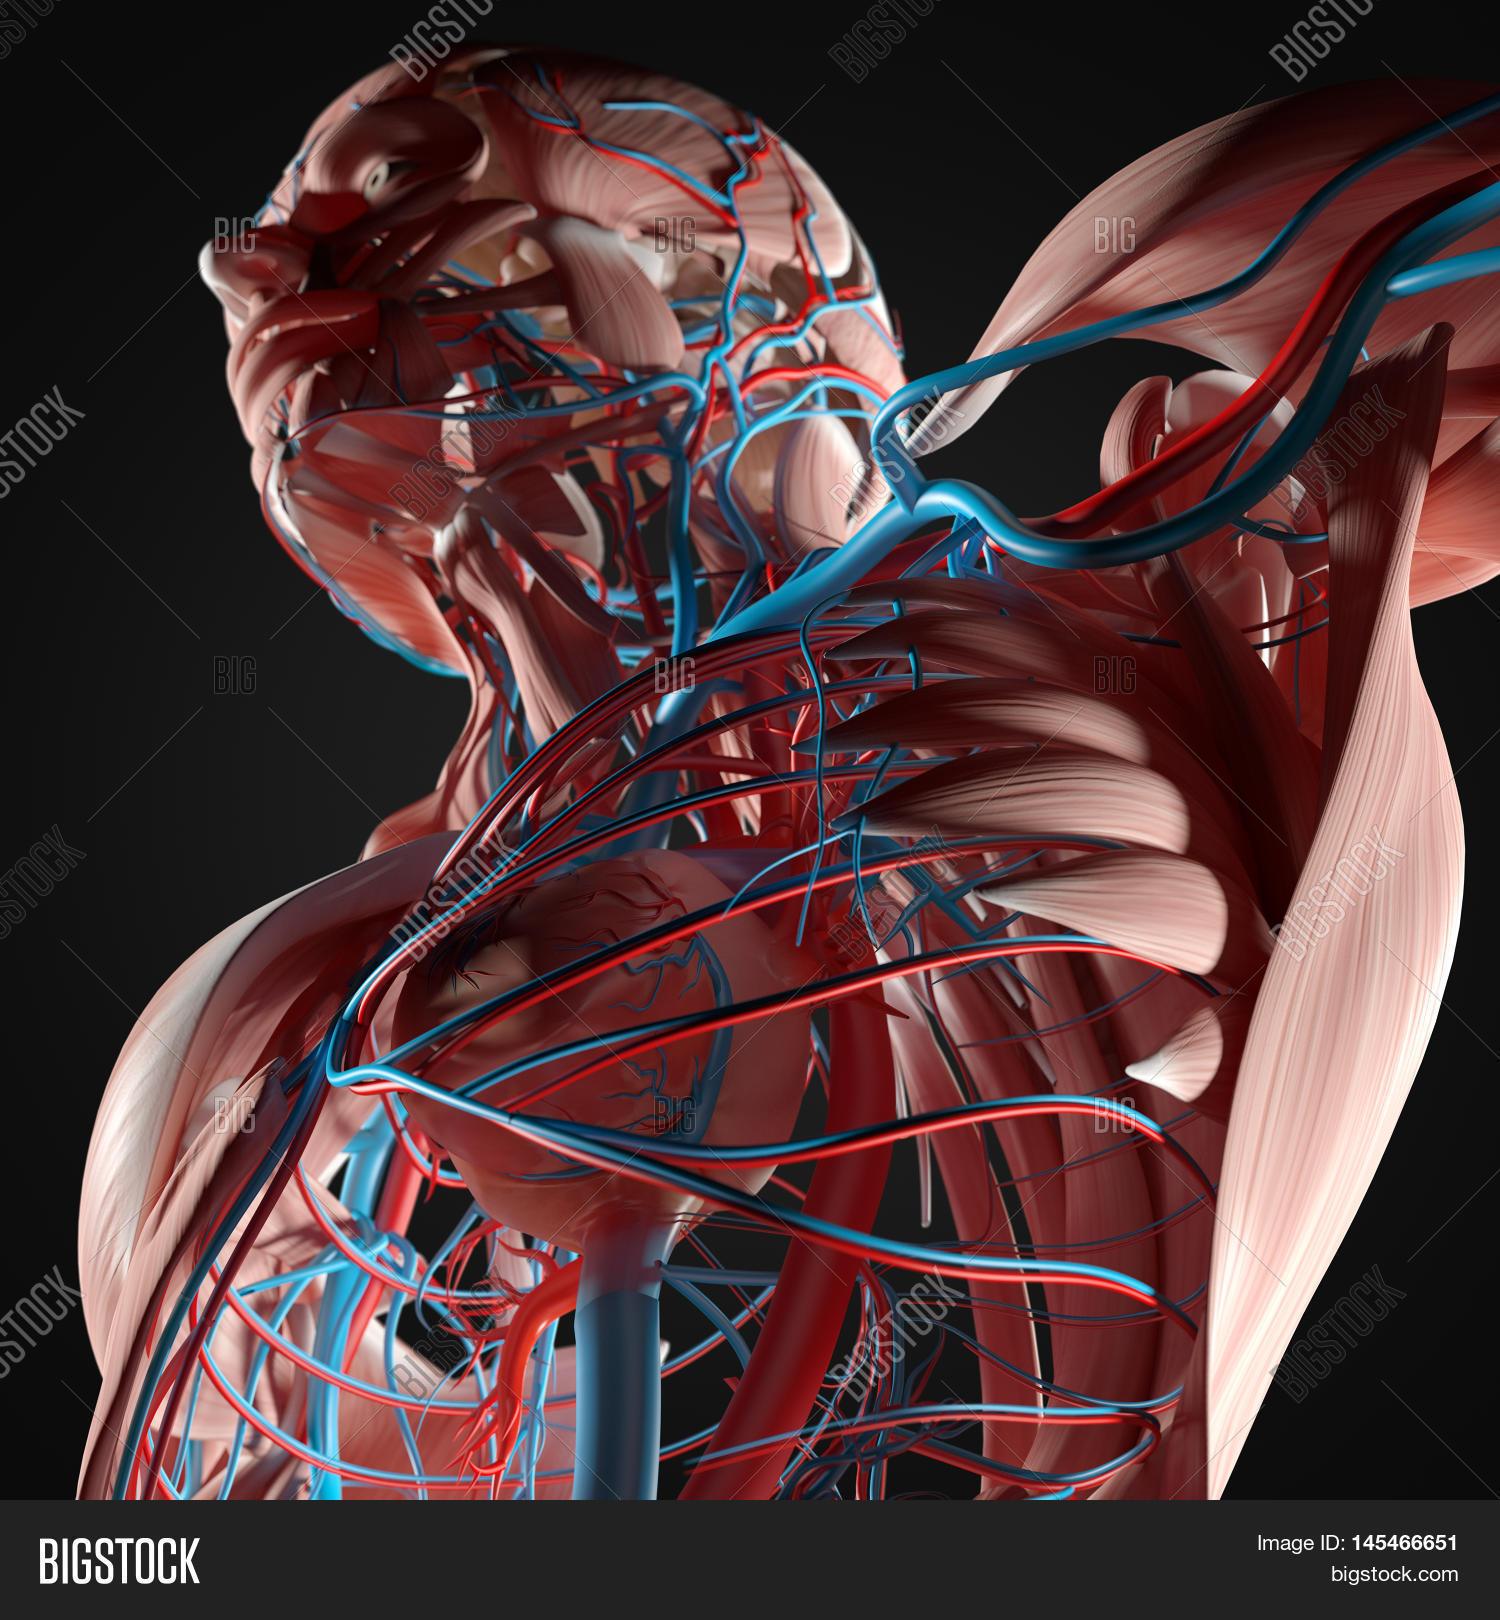 Human Anatomy Torso Image Photo Free Trial Bigstock